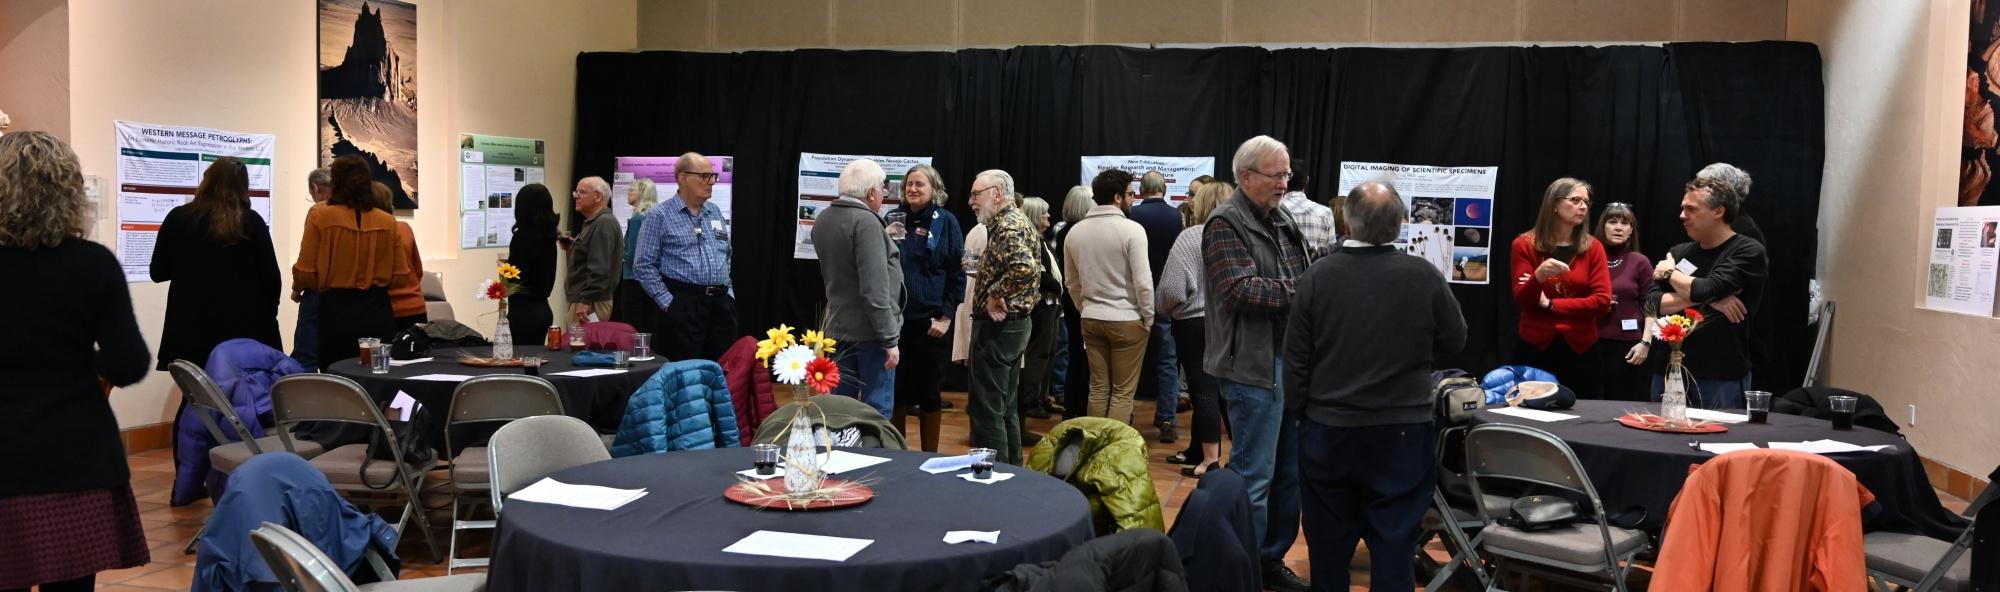 An event for research associates